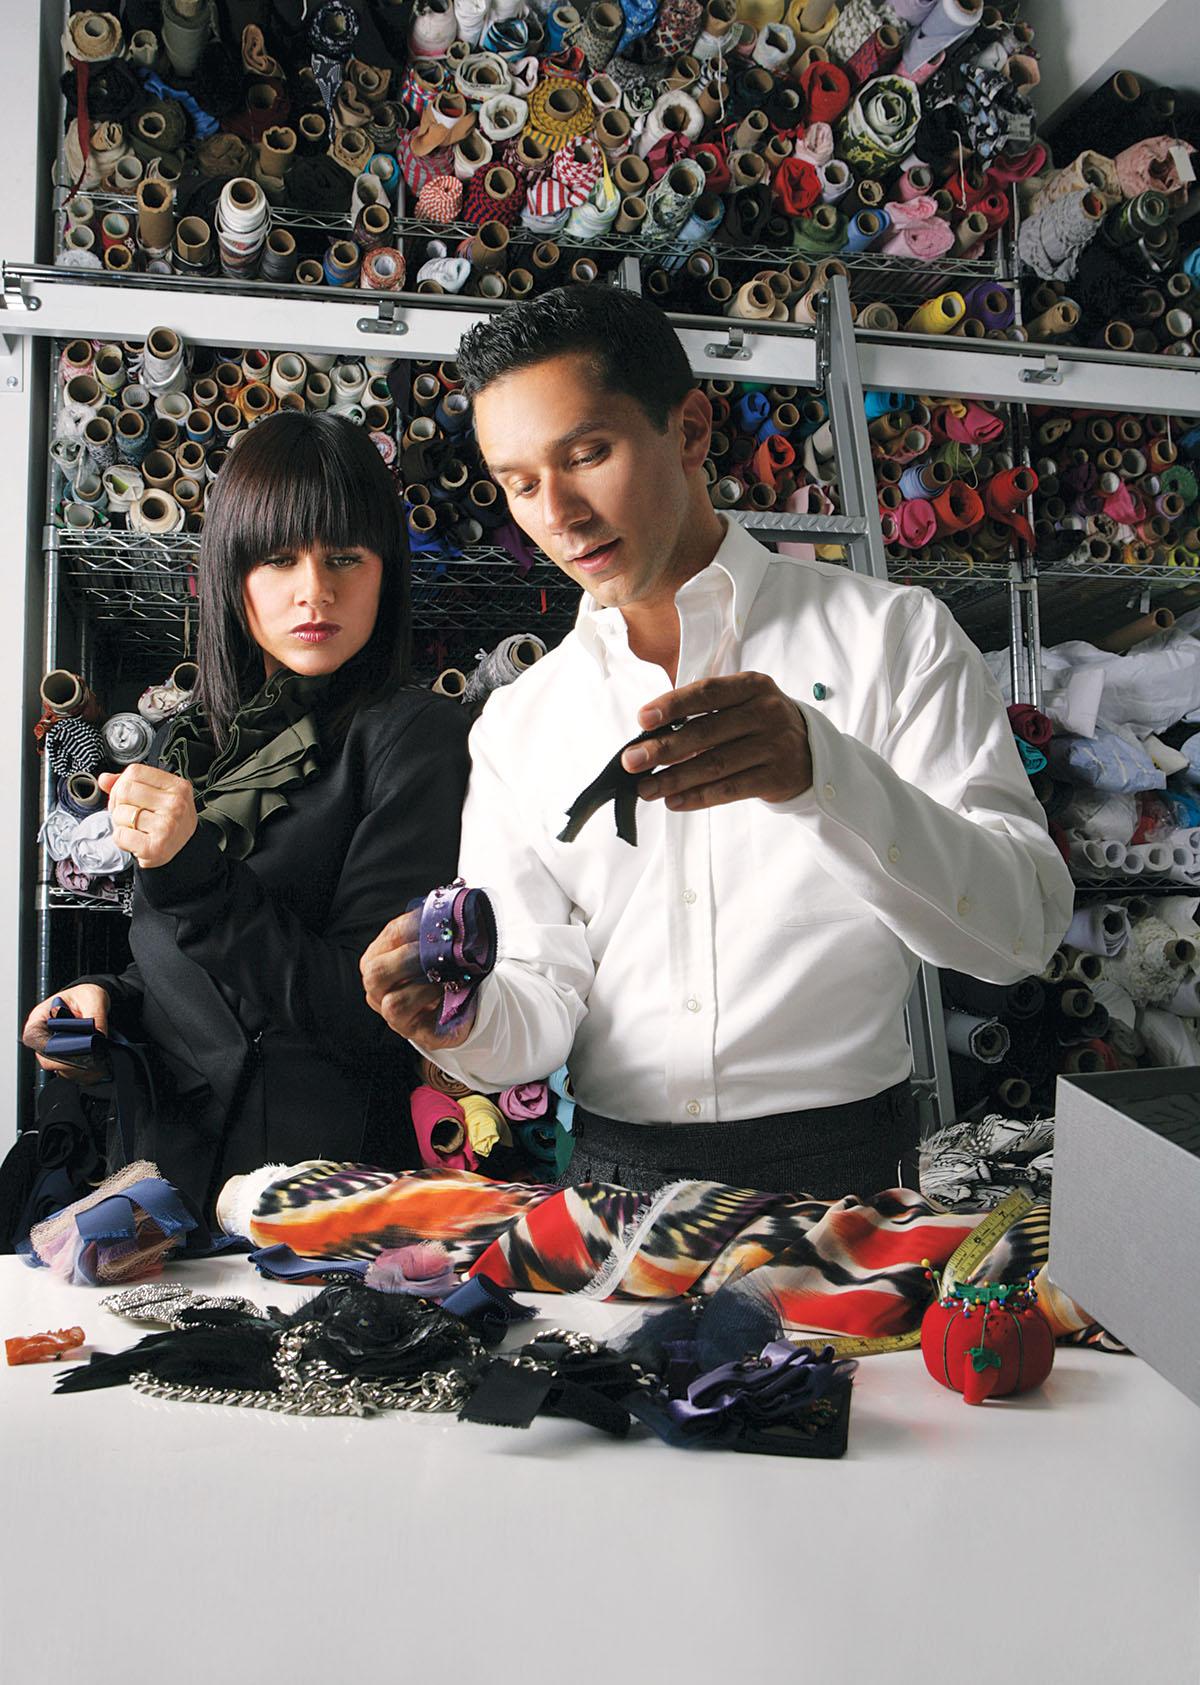 Daniela Corte and Ricardo Rodriguez at work in Corte's studio. Photo by Melissa Mahoney.